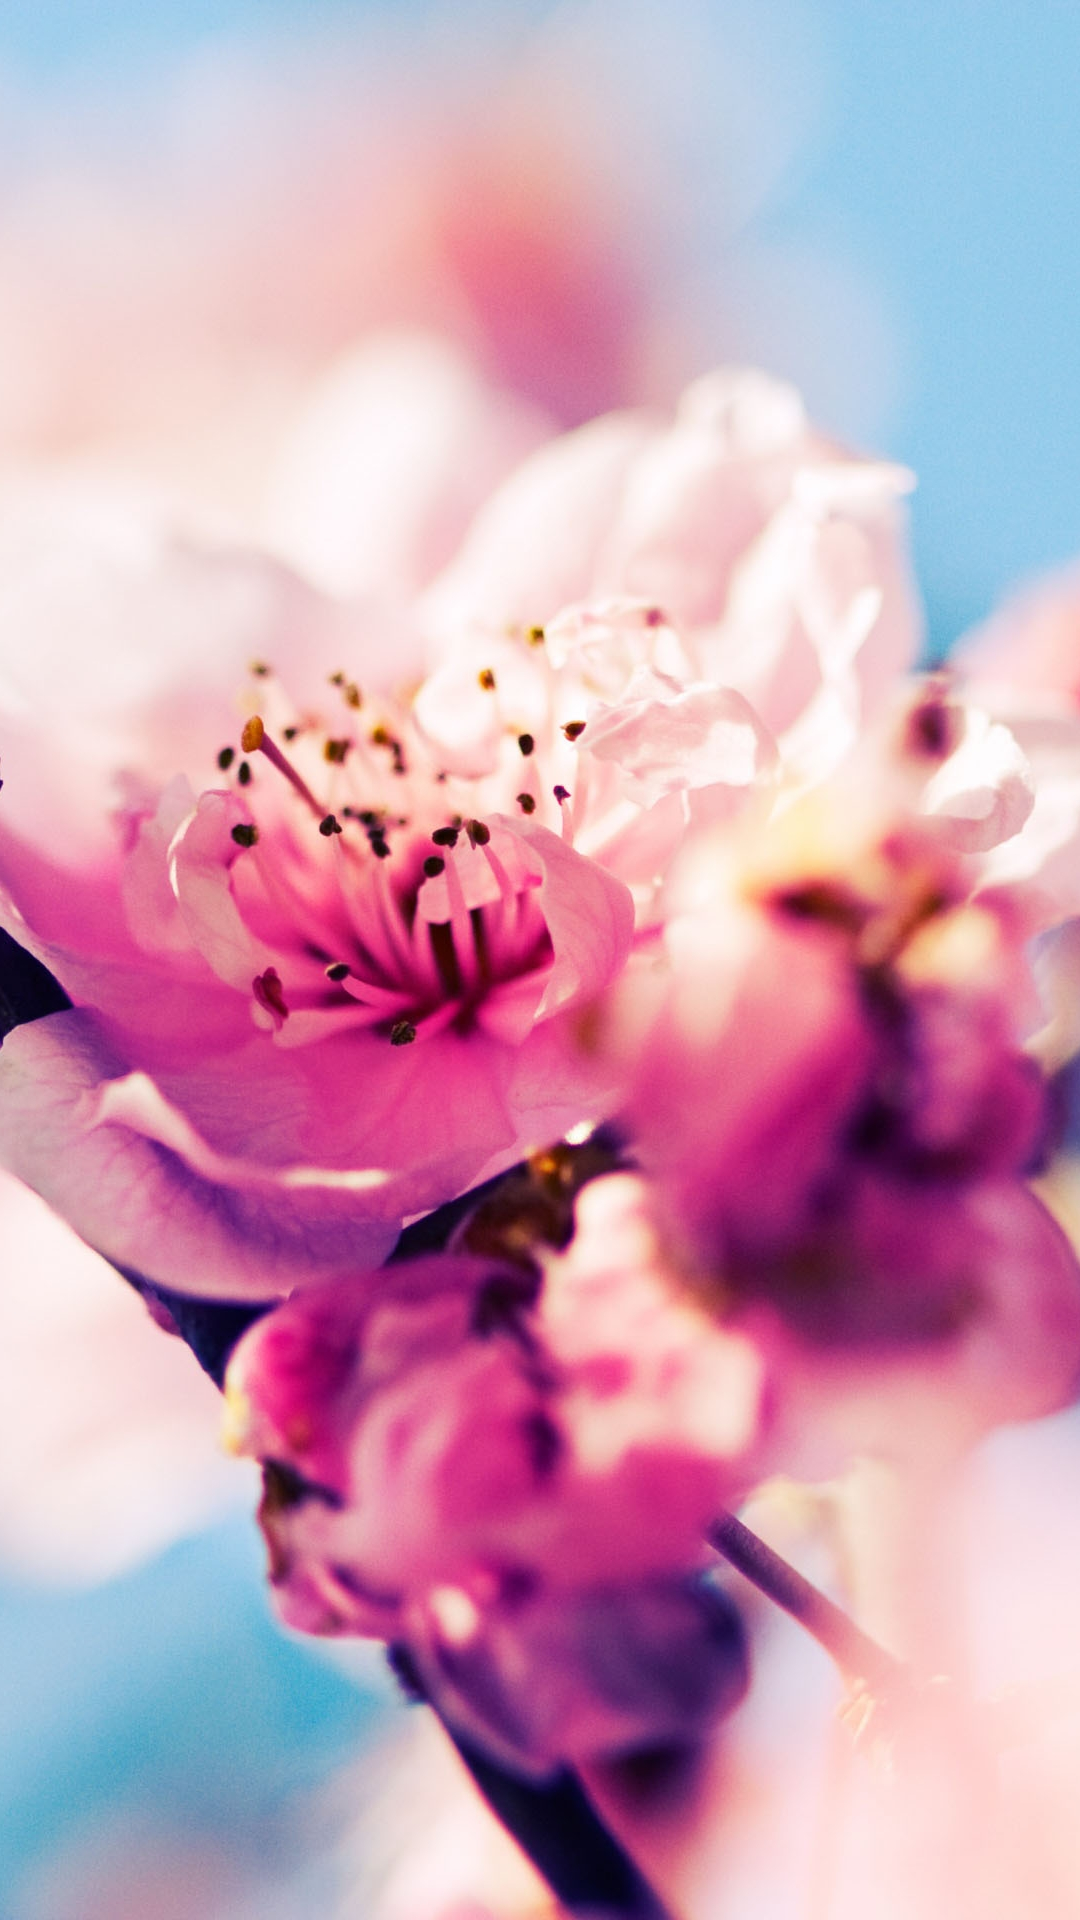 Phone Wallpapers Quotes Hd Cherry Blossom Iphone Hd Wallpaper Pixelstalk Net